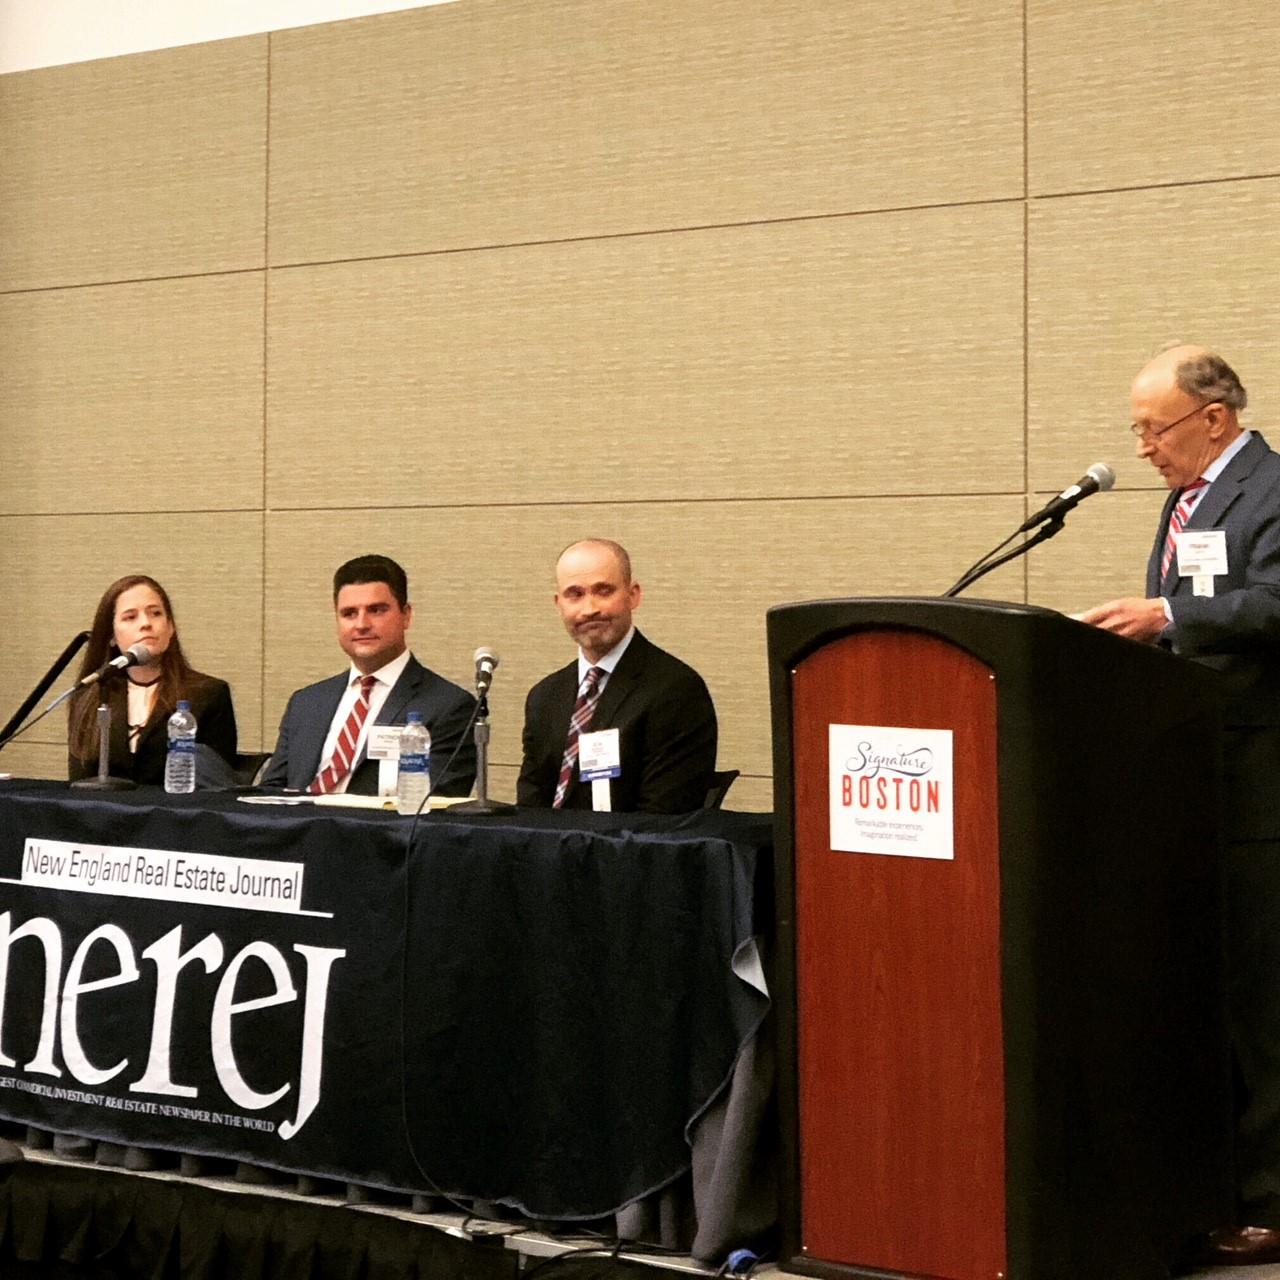 Jon Michalek,Flynn Law Group, Alison Kinchla from Bernkopf Goodman, and Patrick Brady of Cornerstone Realty Capital